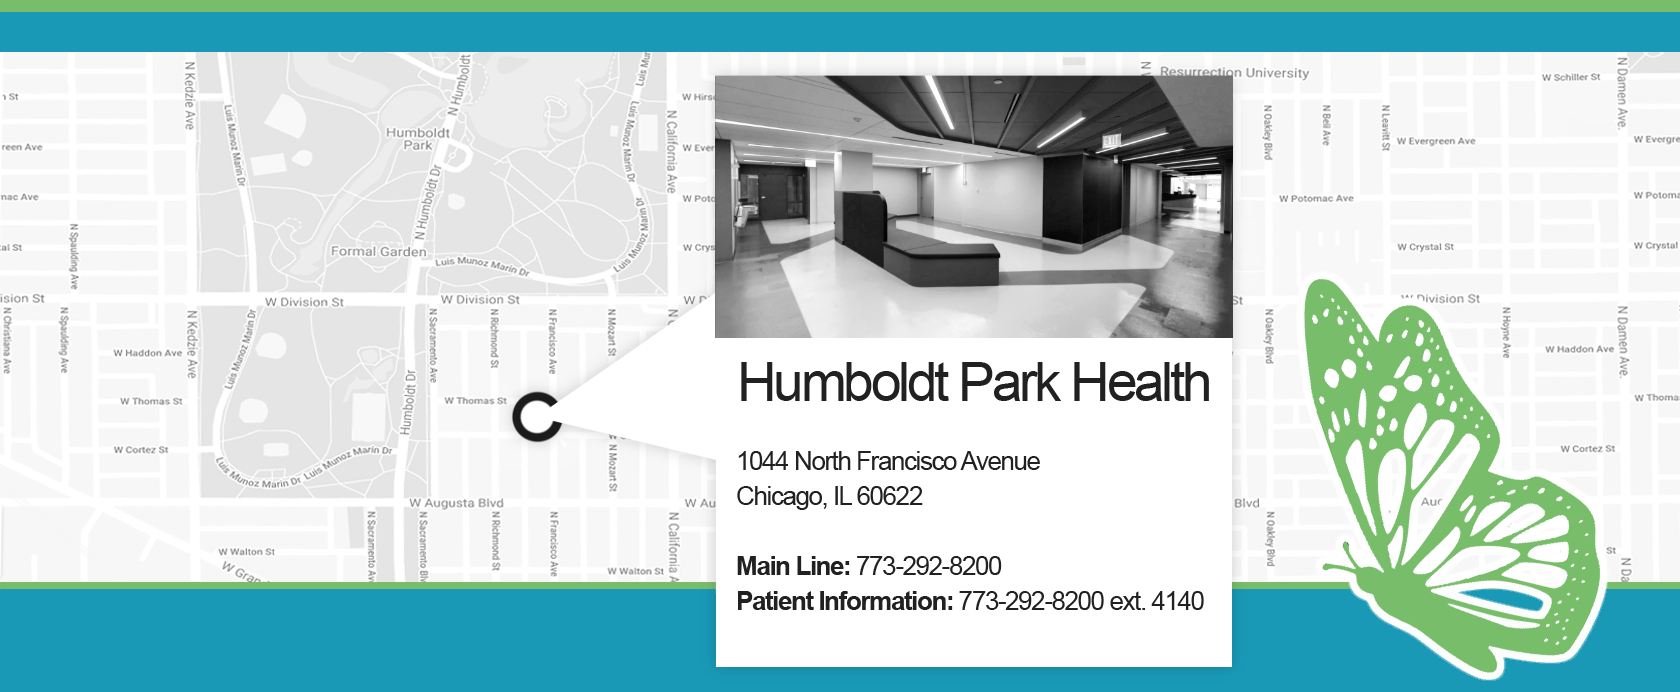 Humboldt Park Health